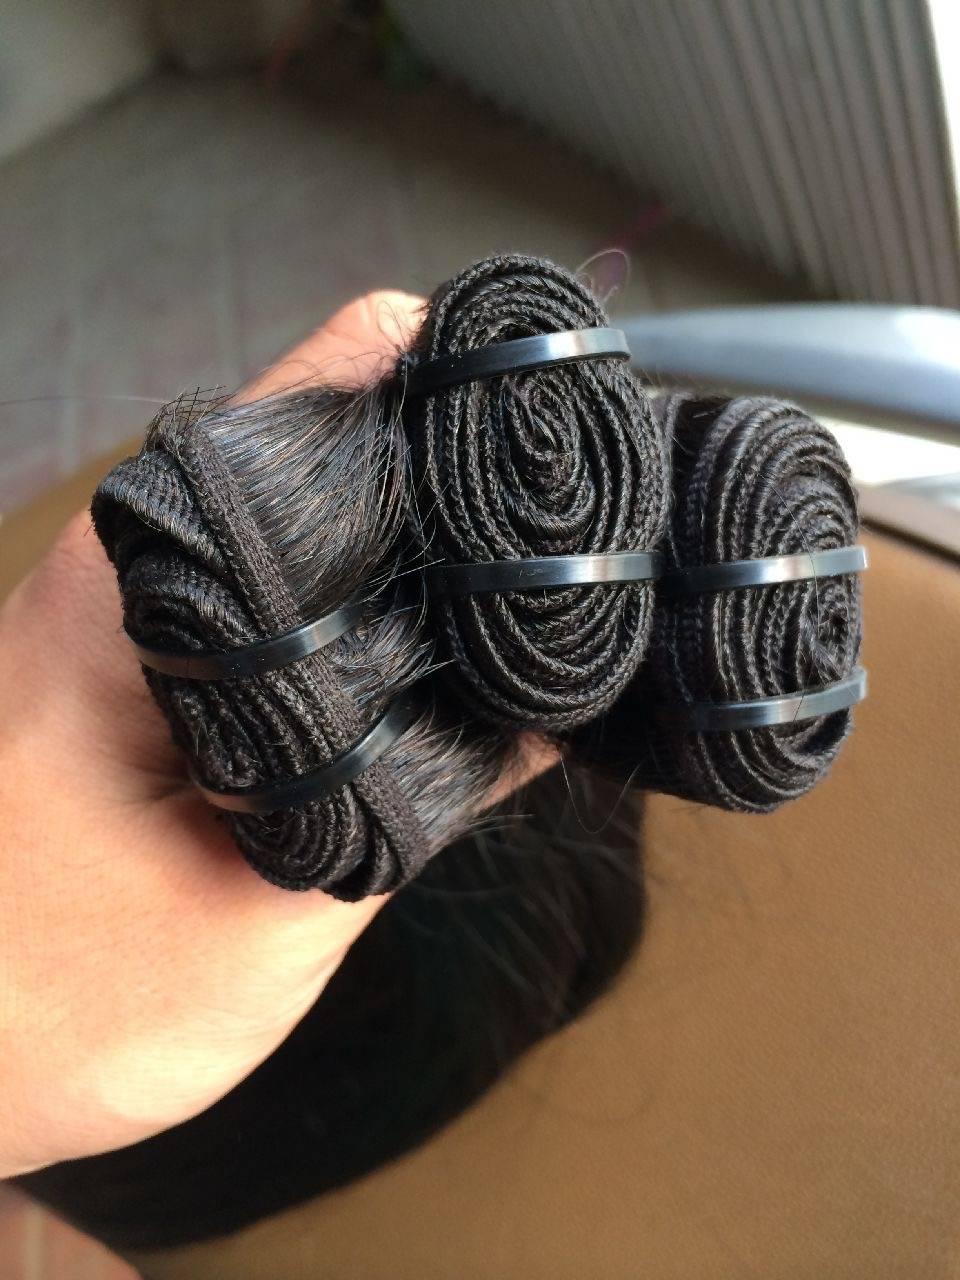 Vietnamese weft large stock grade AAAAA 12-32 inches100% human raw virgin unprocessed weft hair